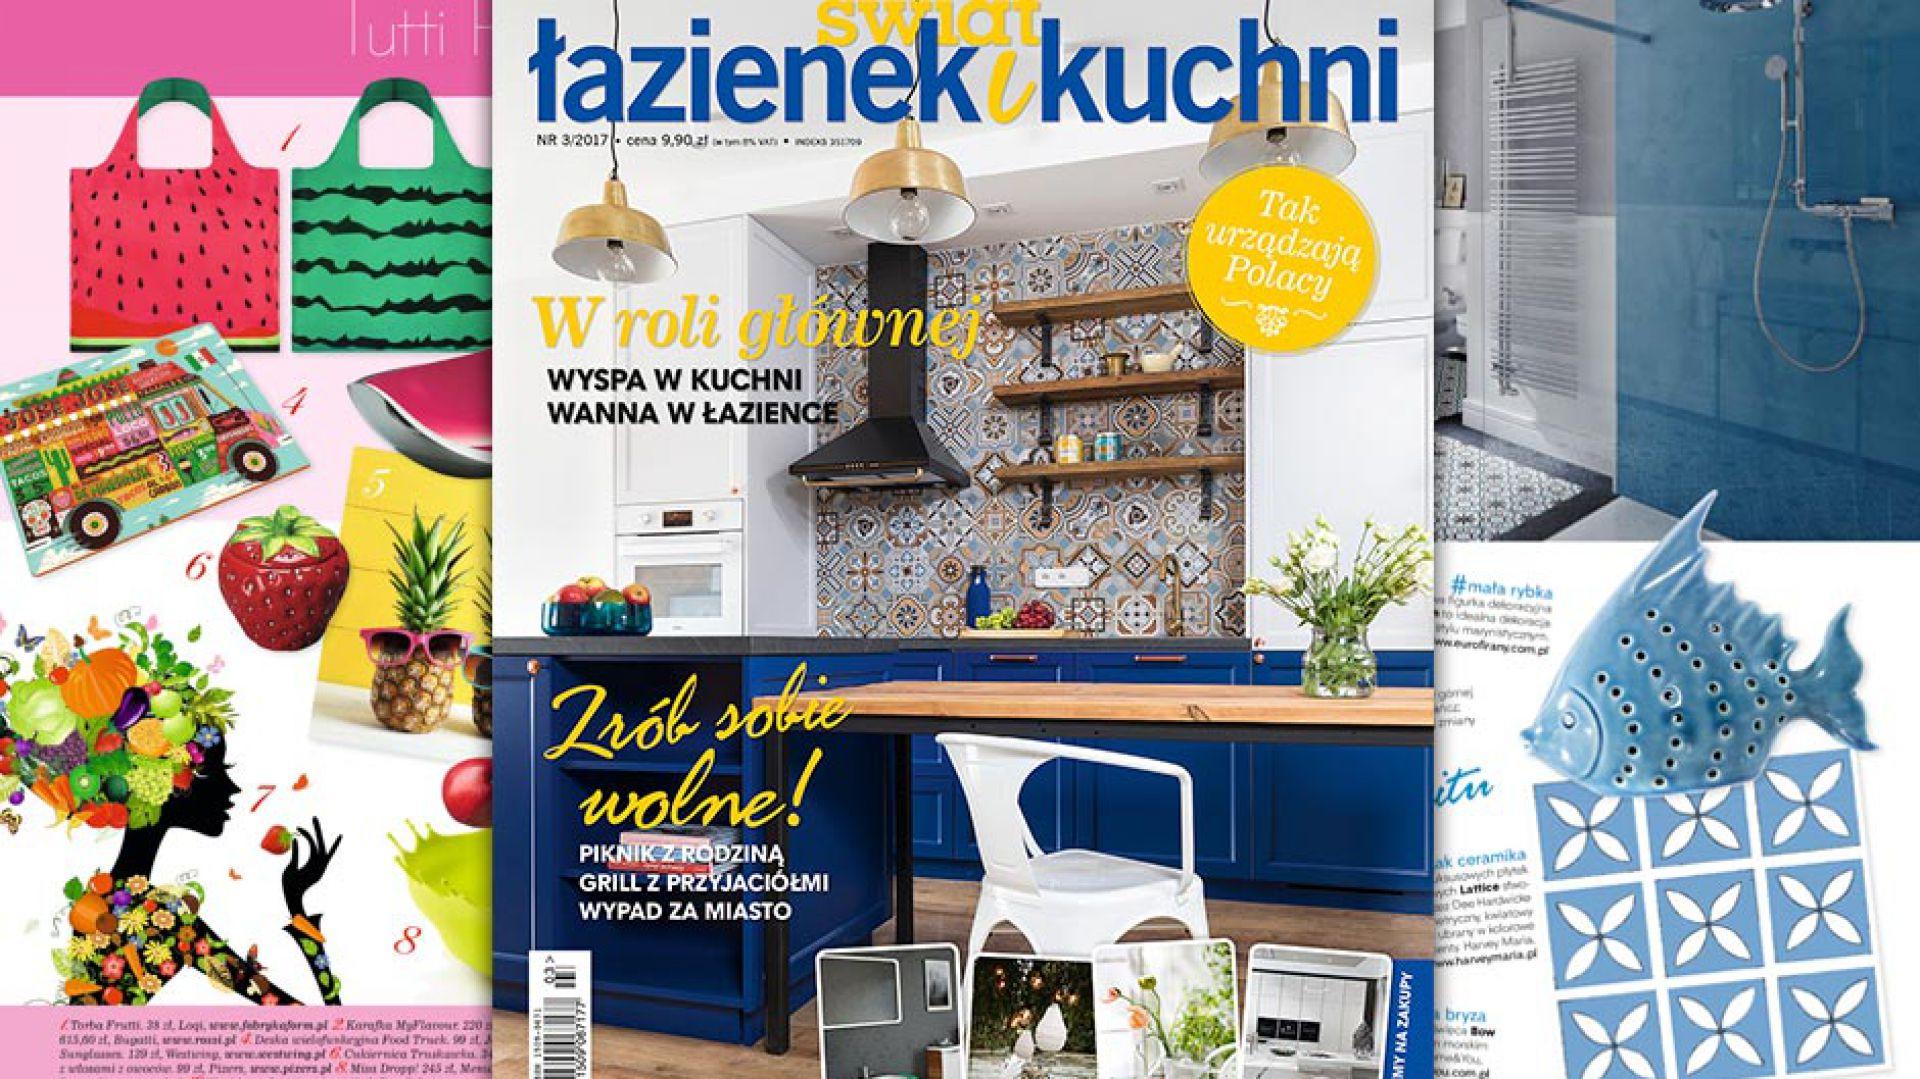 Świat Łazienek i Kuchni (3/2017)